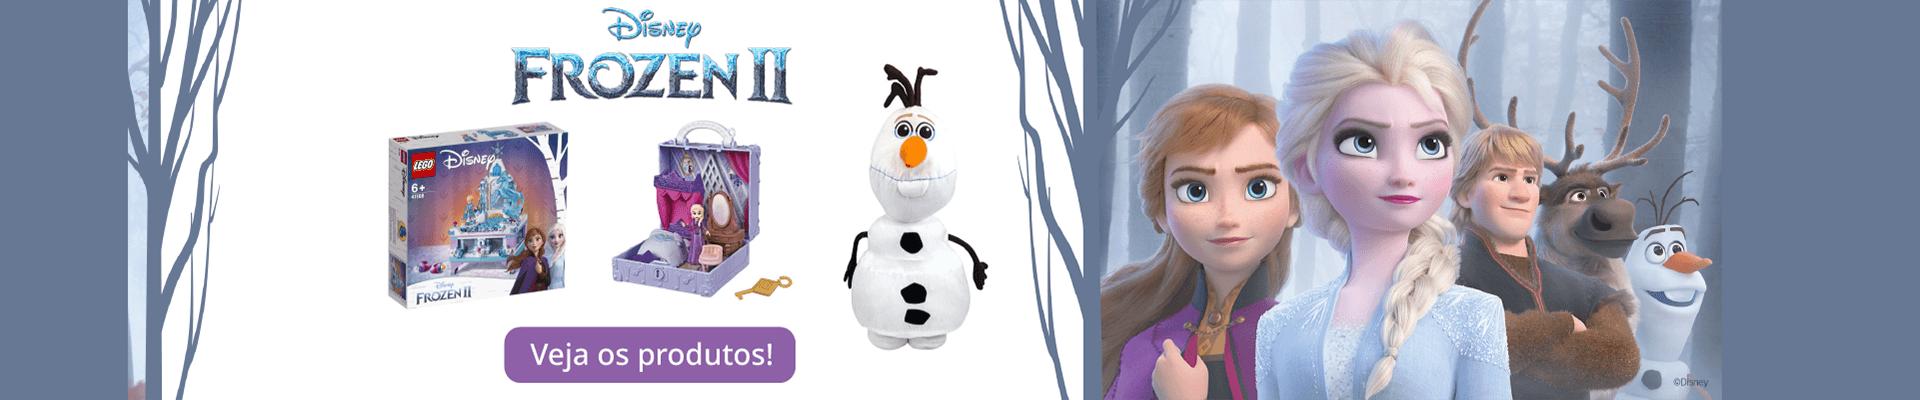 Banner Lançamento Frozen 2